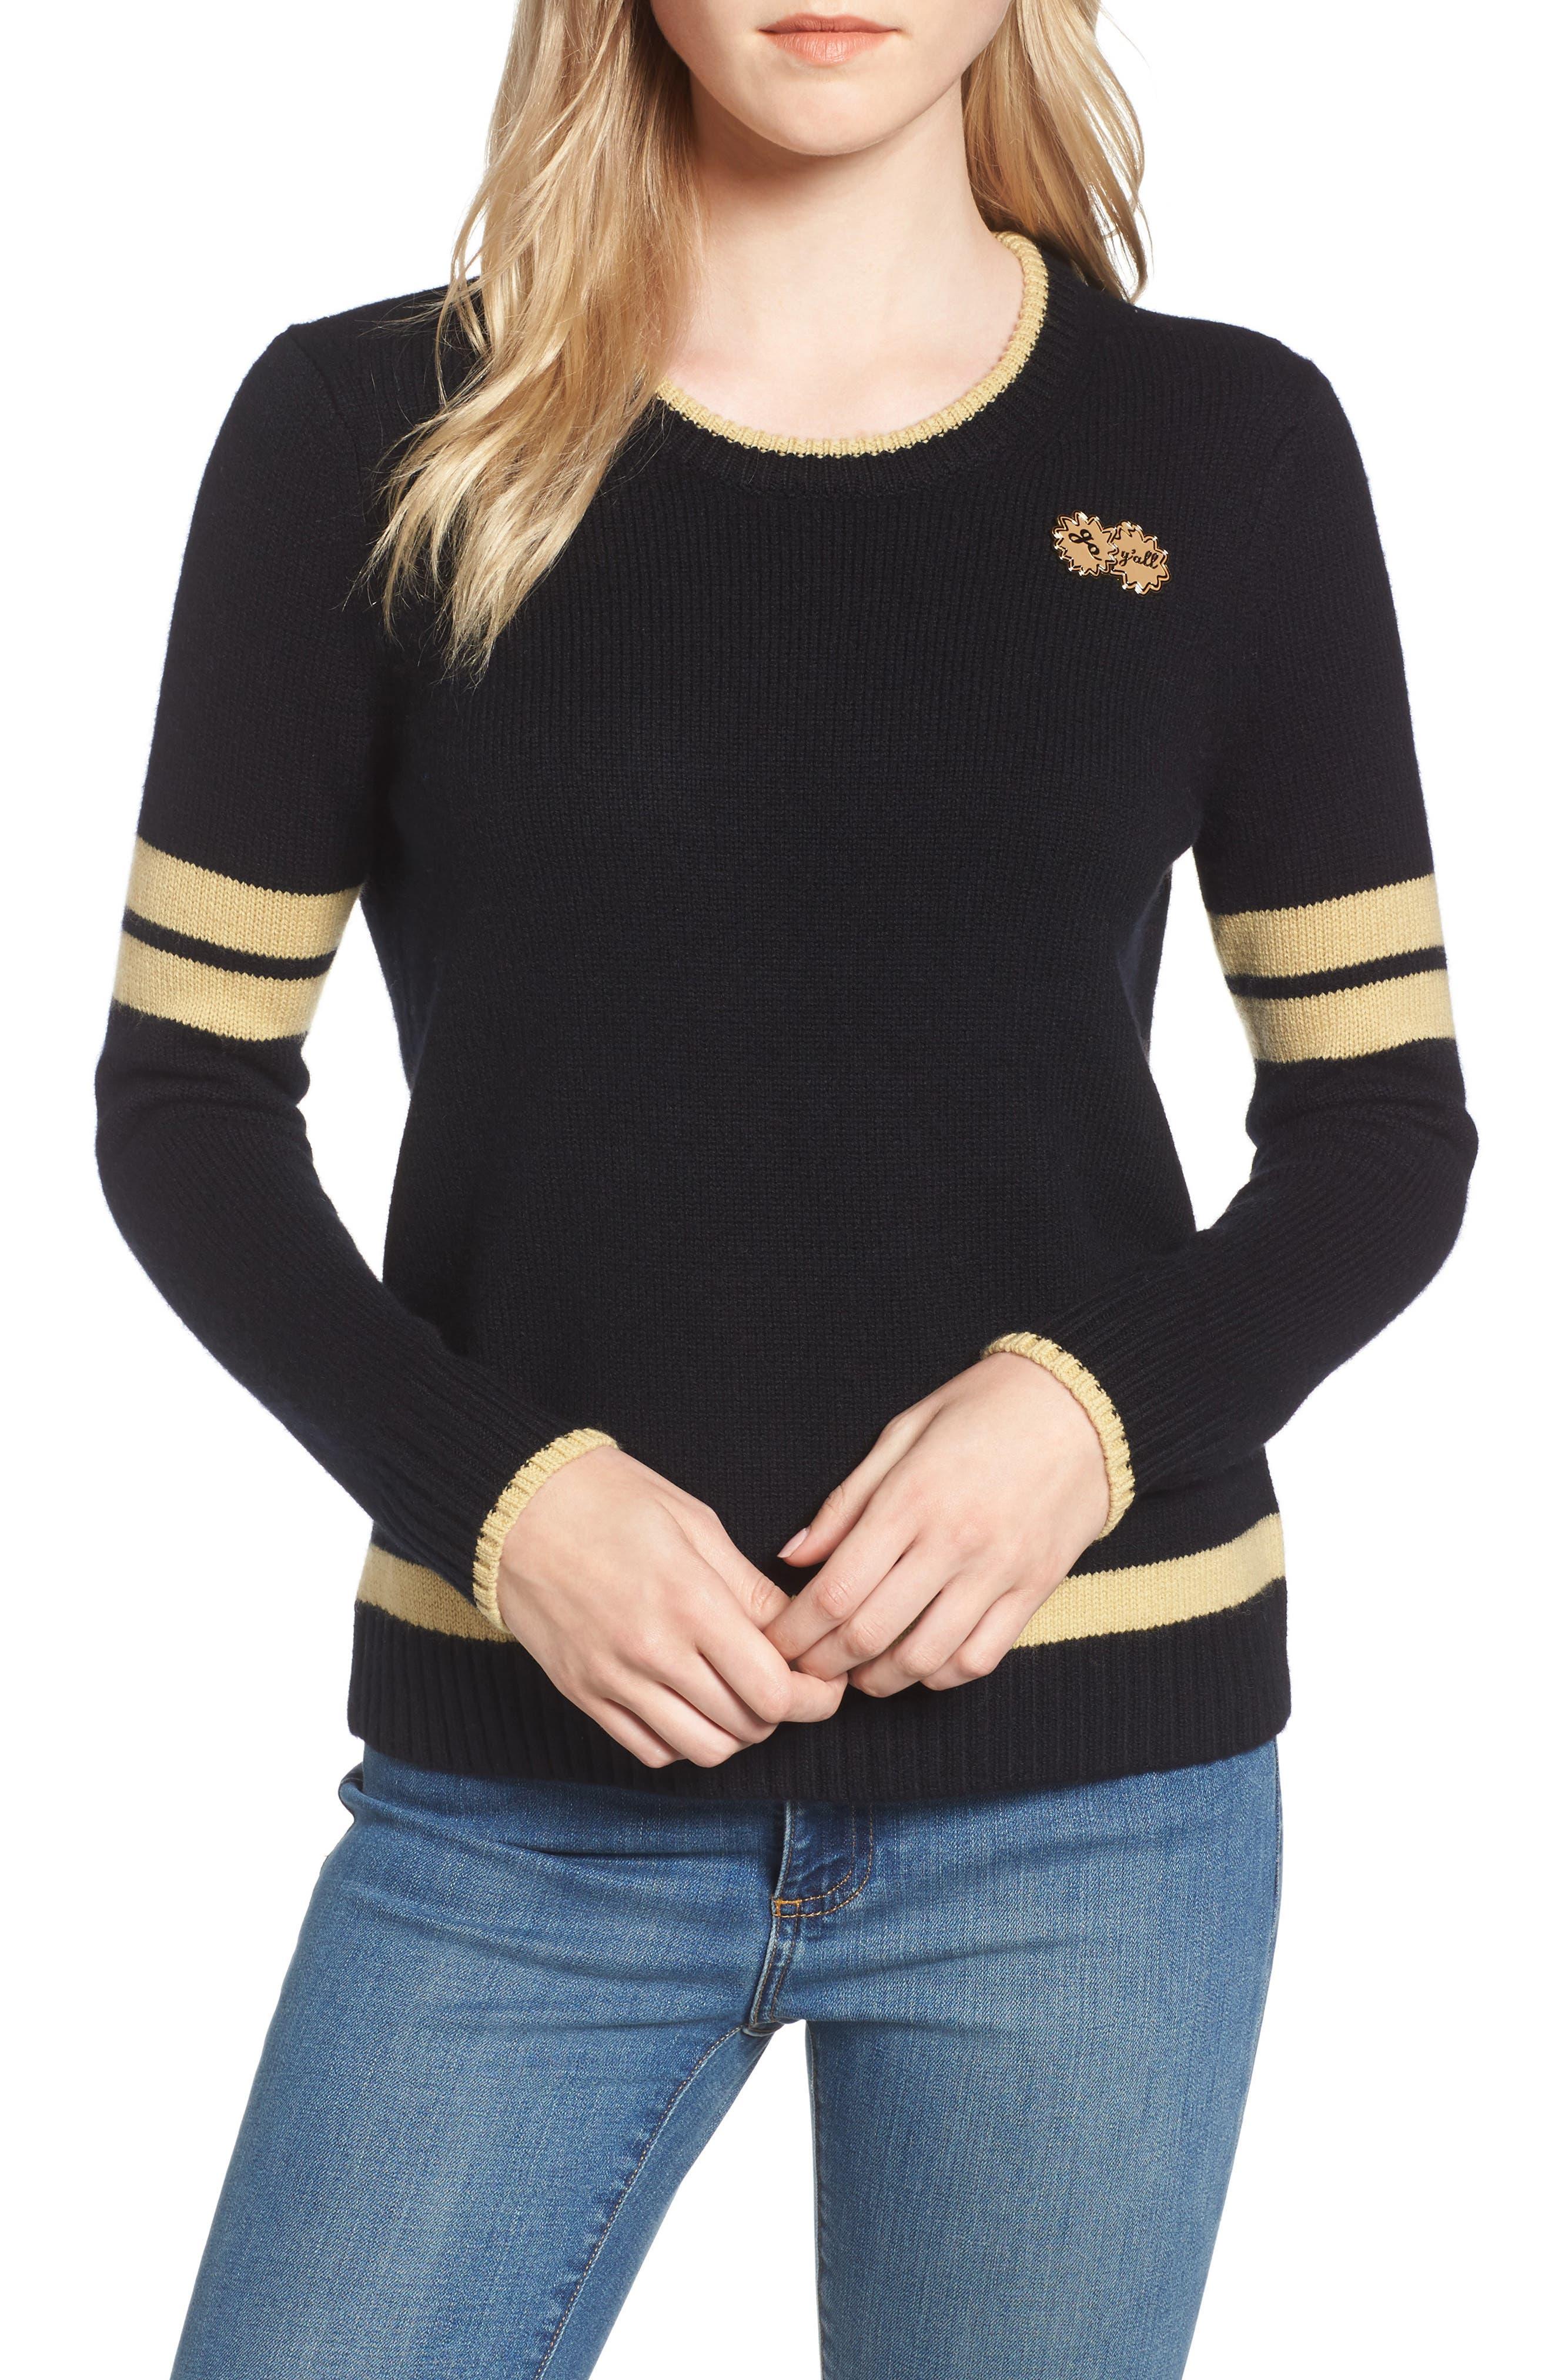 Spirit Sweater,                             Main thumbnail 1, color,                             Black/ Gold